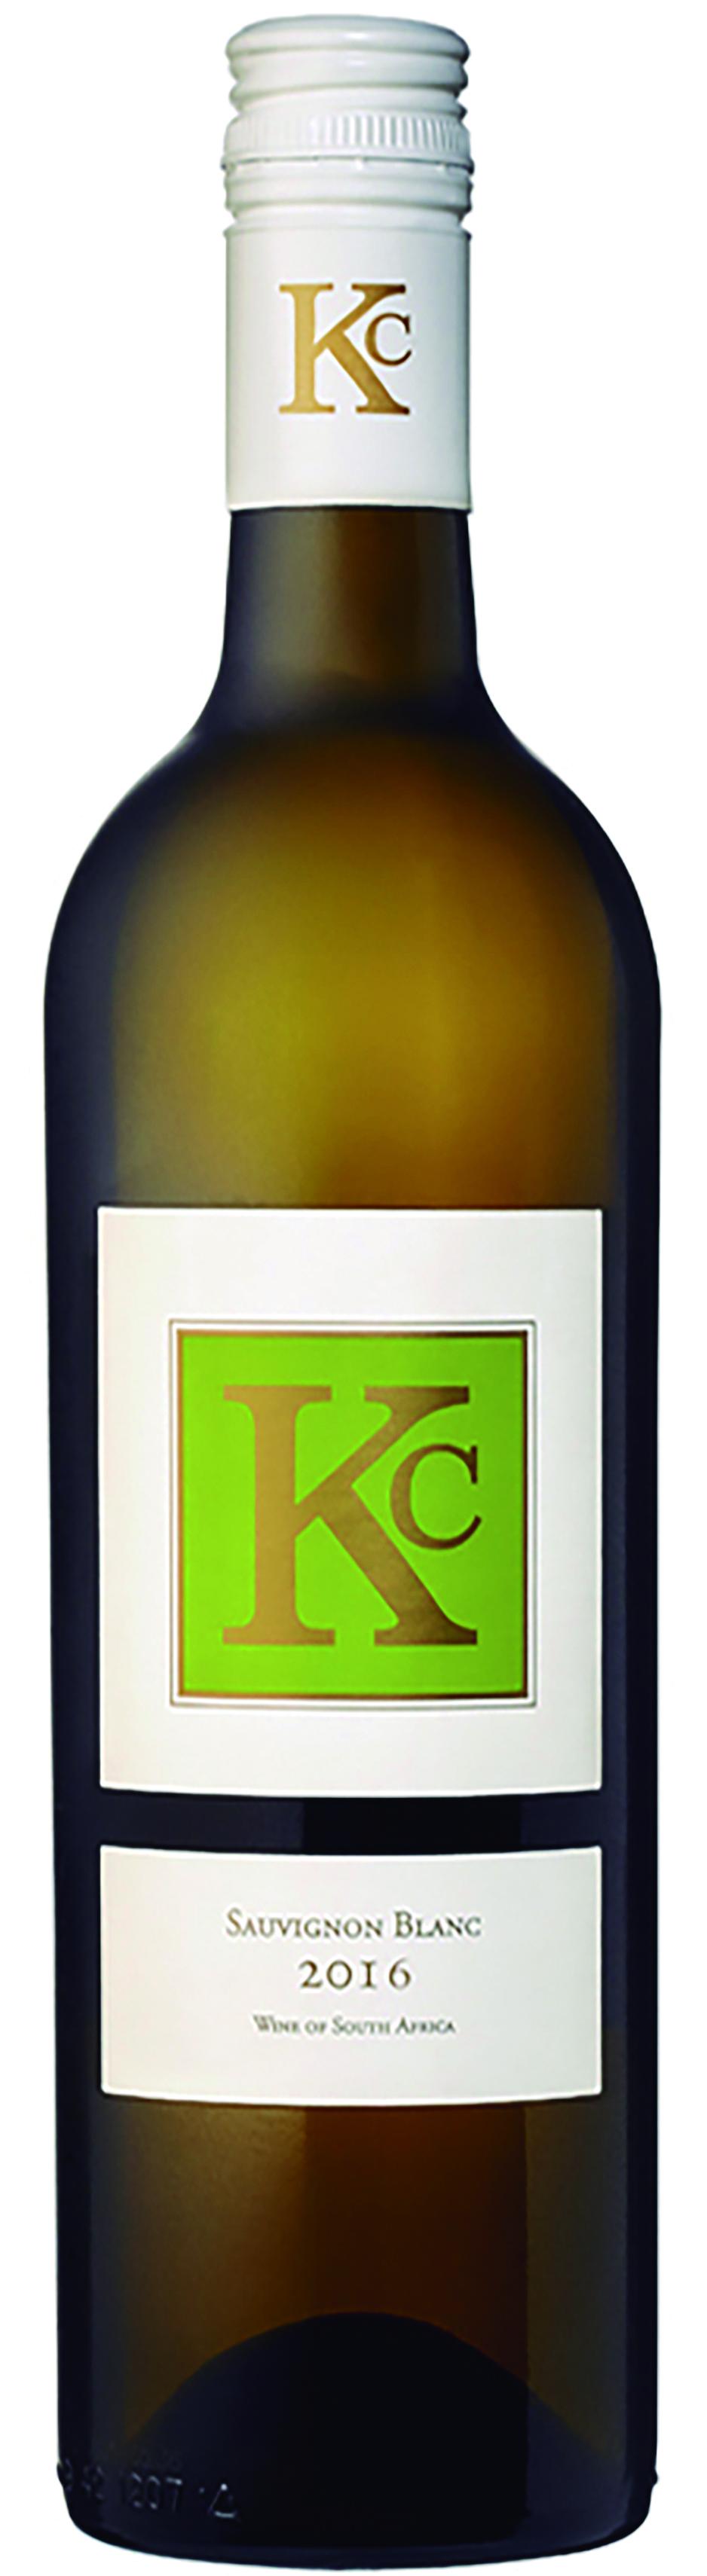 Vinho Branco Klein Constantia KC Sauvignon Blanc 2017 - Grand Cru